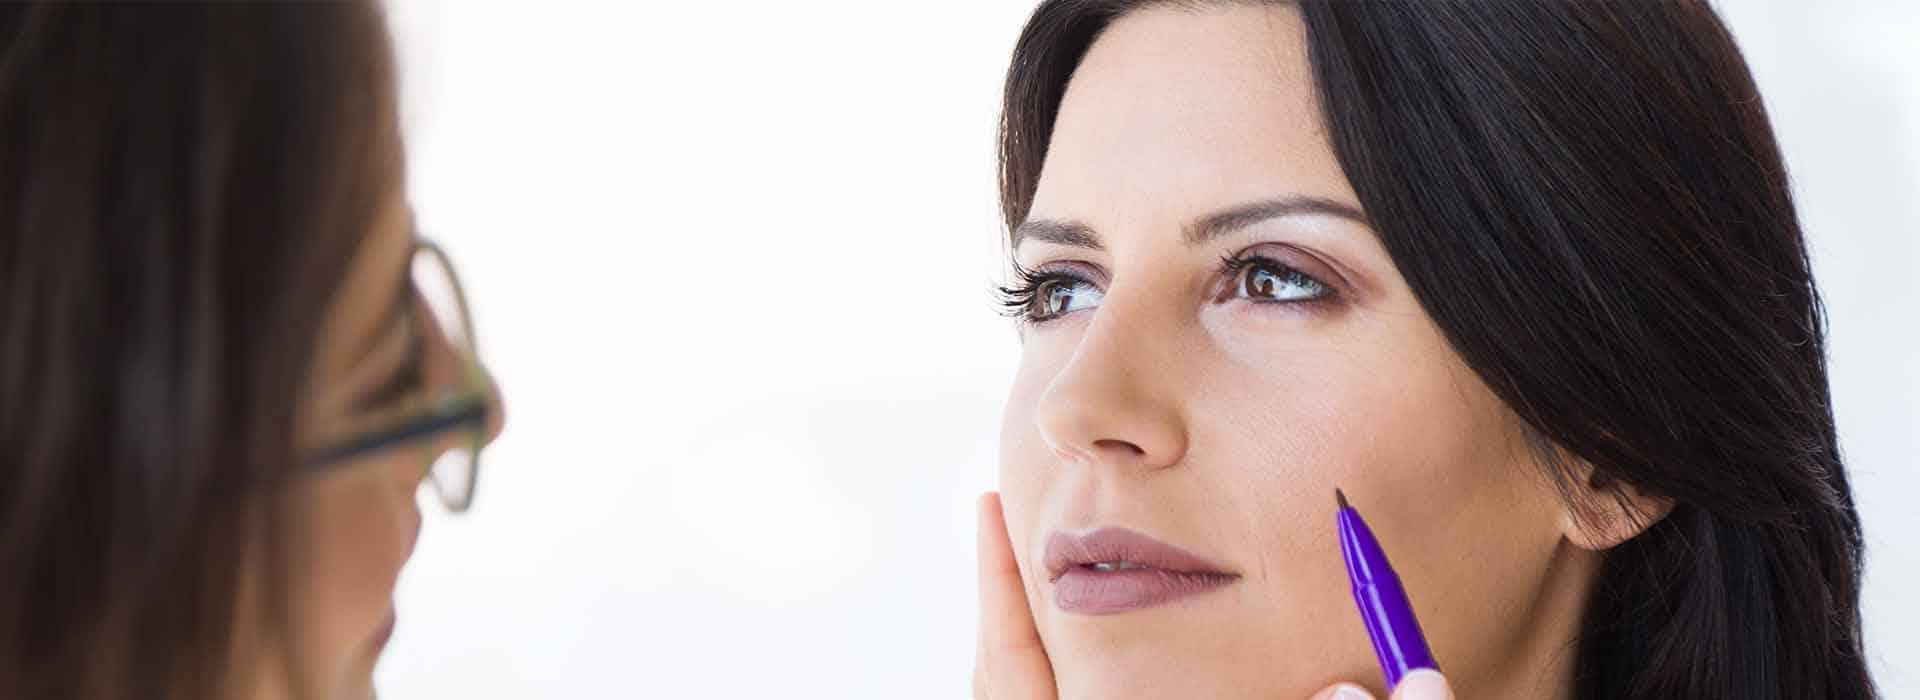 Lipofilling o lipoescultura facial